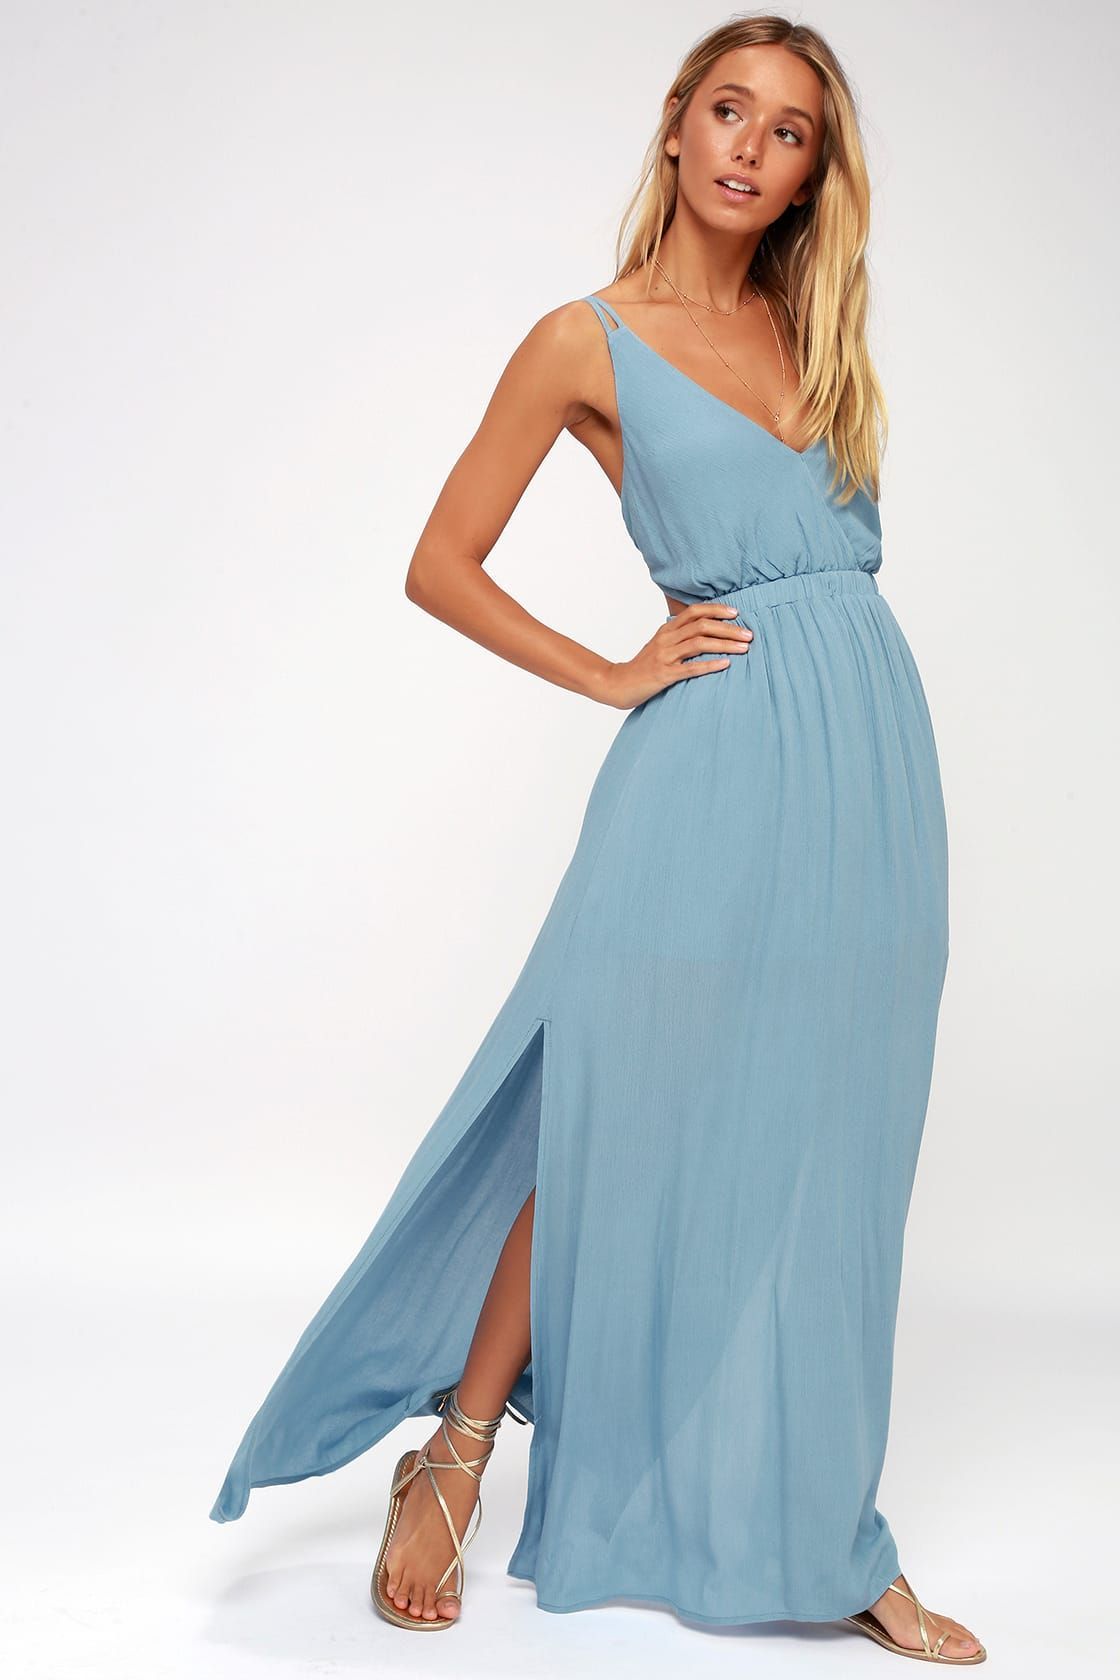 15151f03622 Lovely Slate Blue Dress - Backless Dress - Maxi Dress